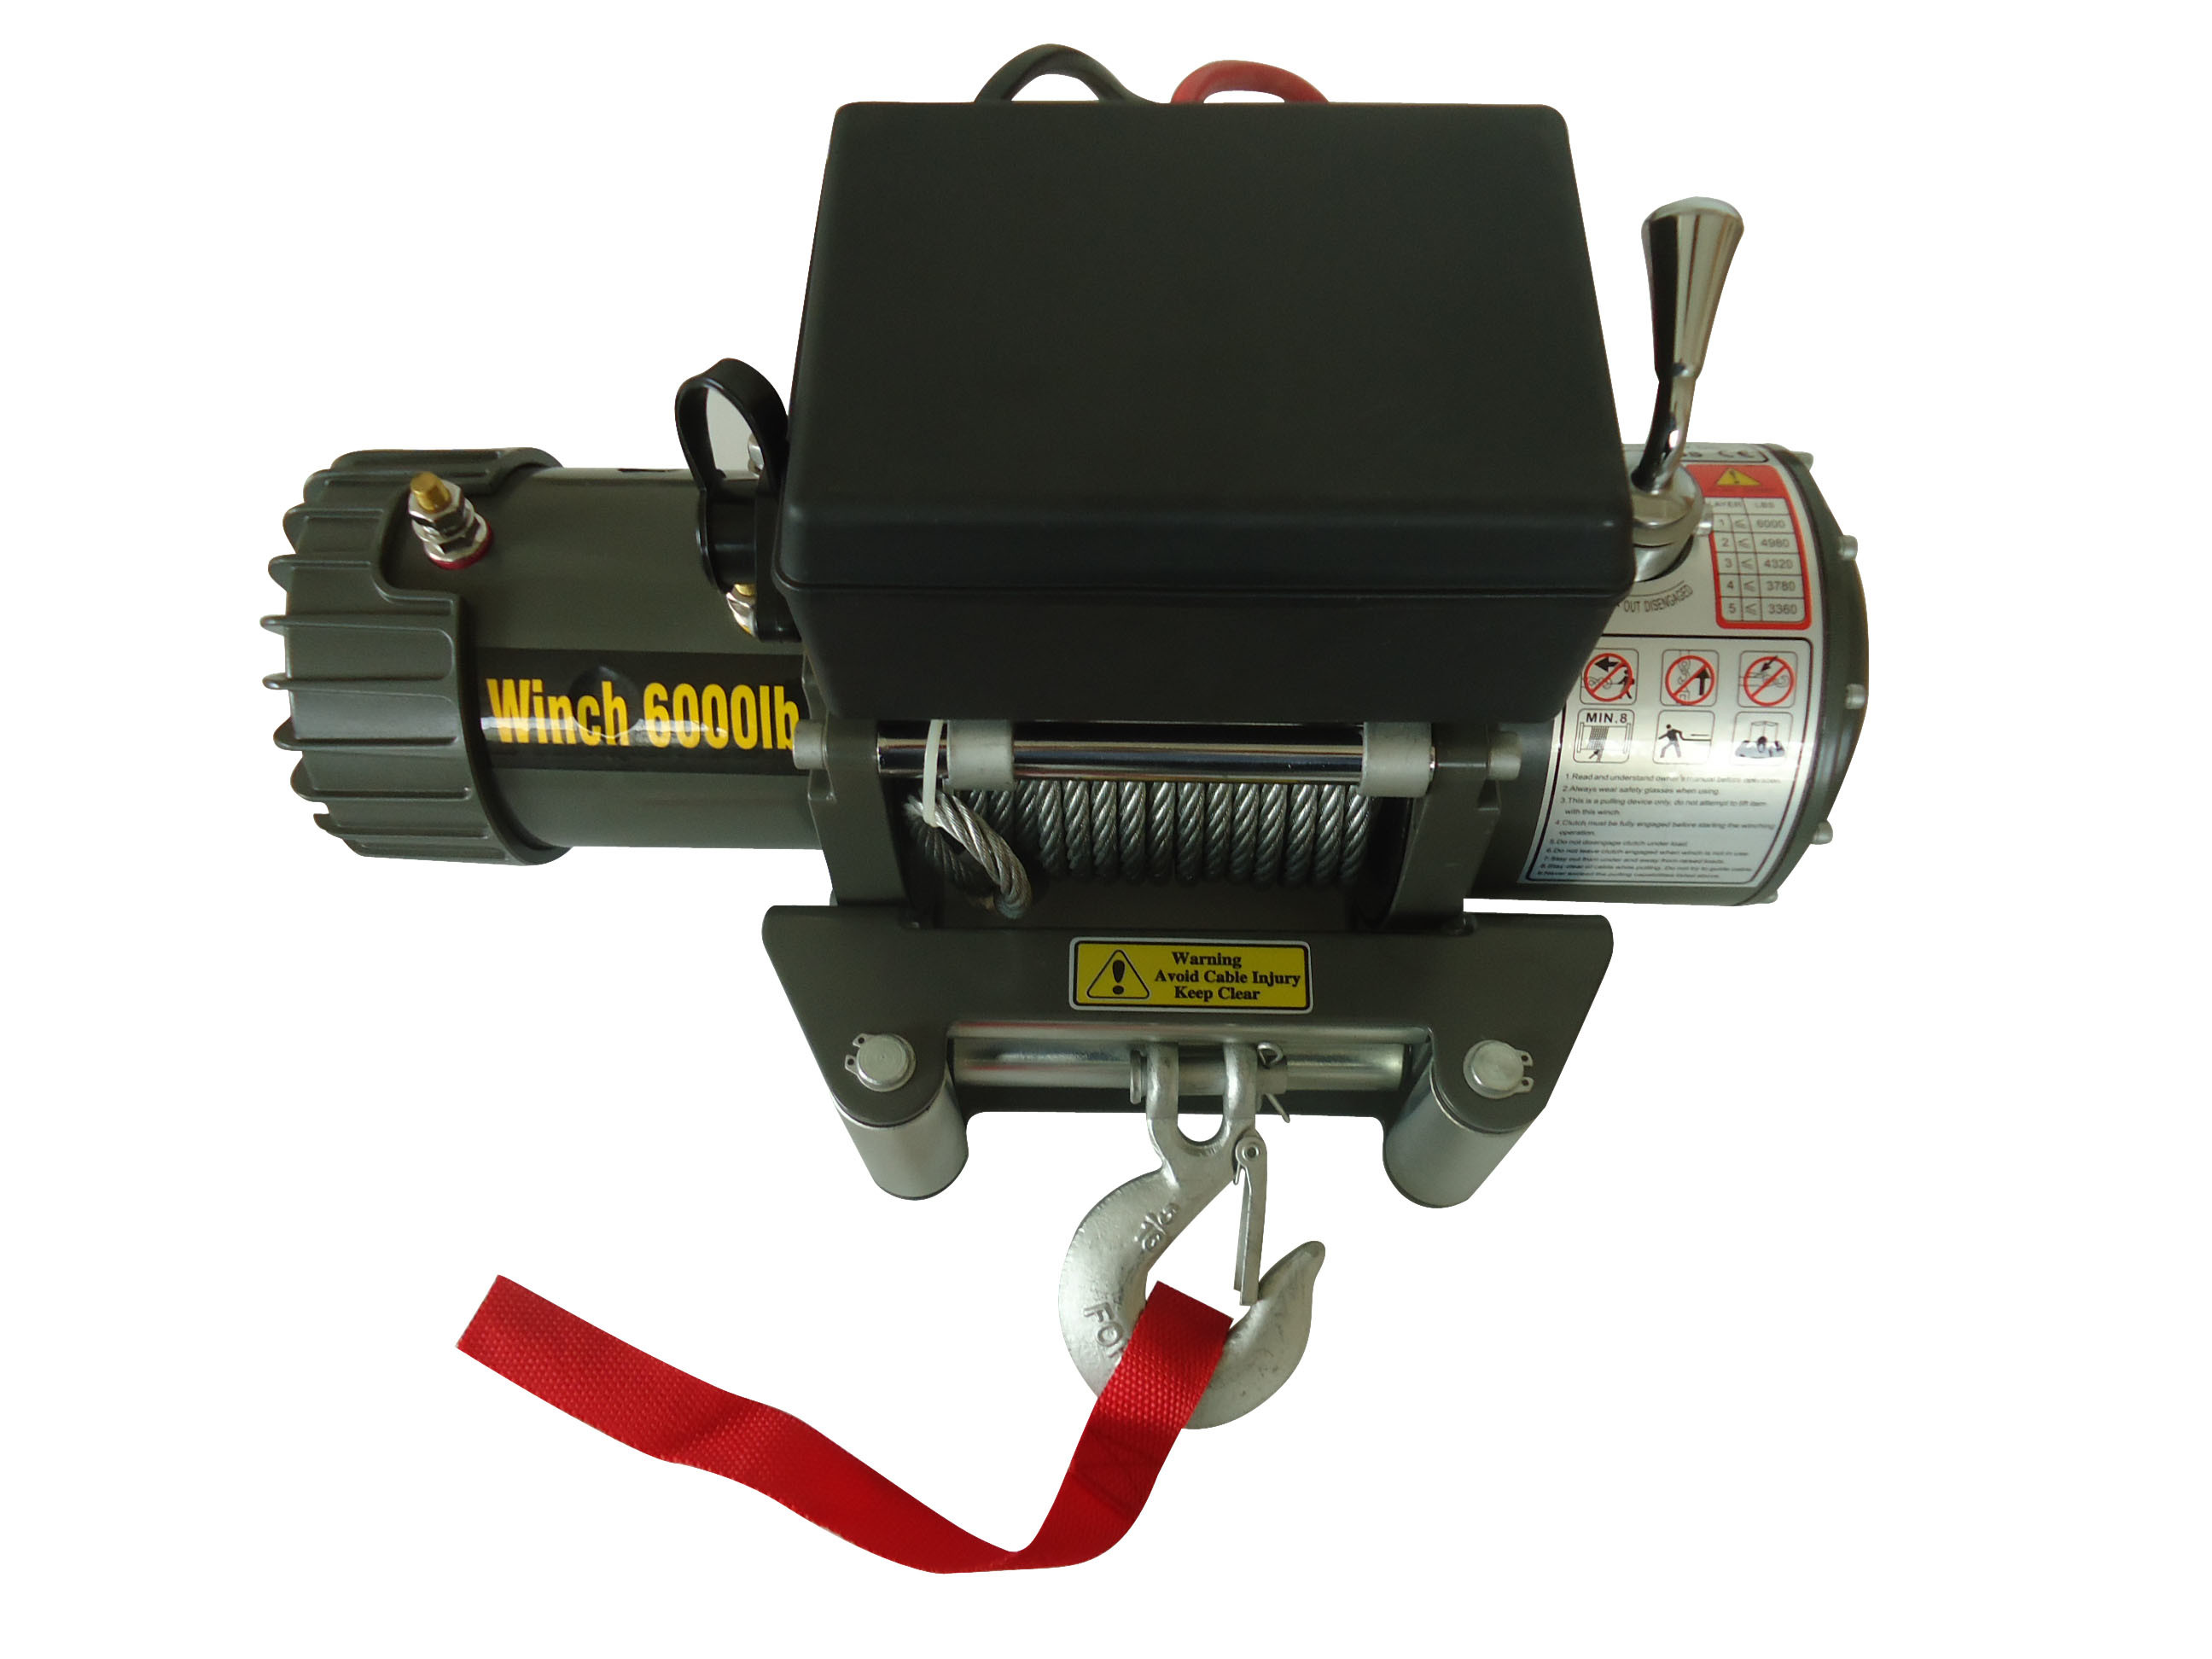 off Road Winch 6000lb, Chima Electric Winch 12V DC